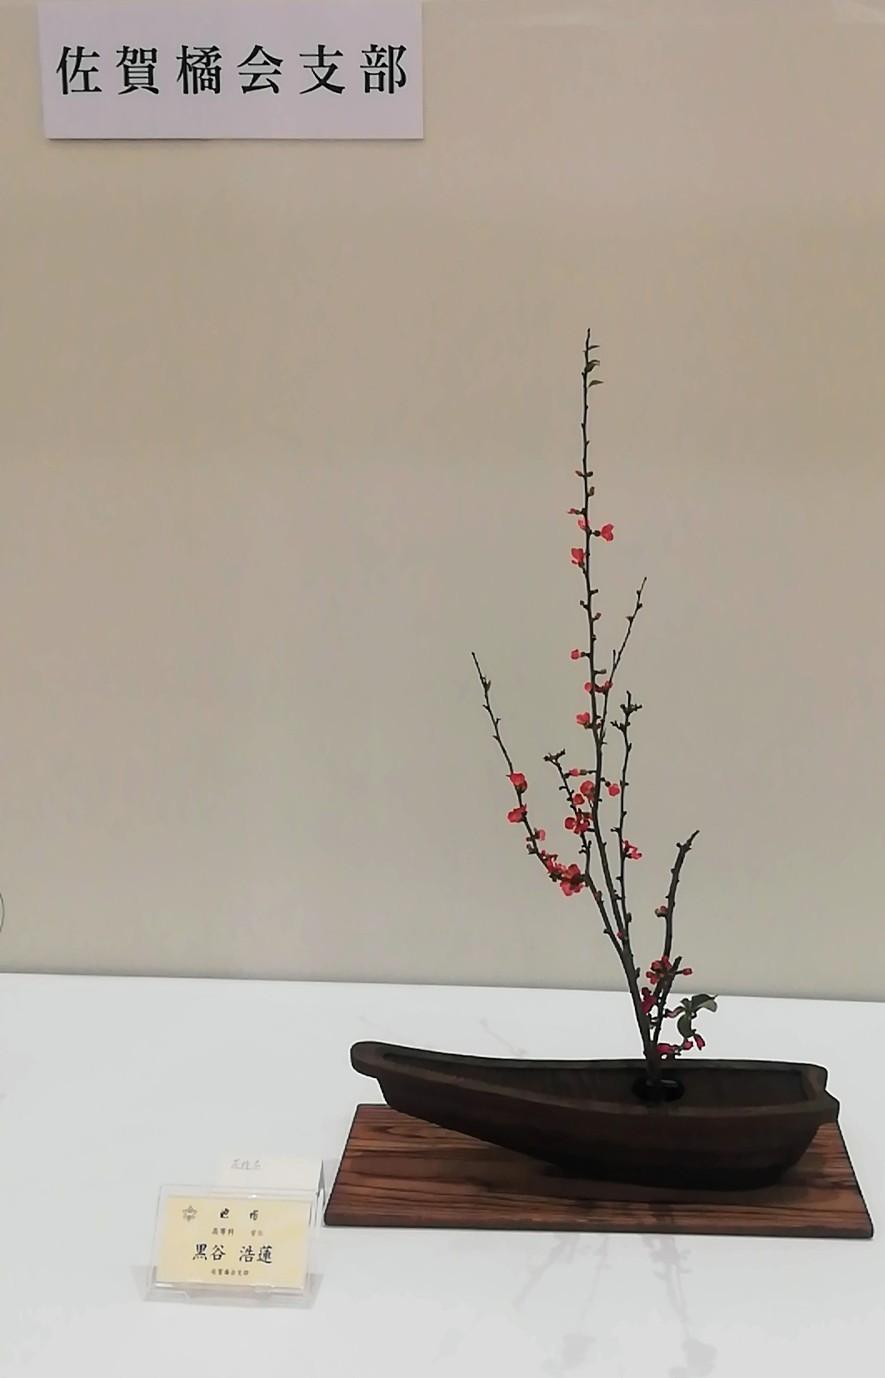 池坊佐賀県連合支部創立100周年記念いけばな池坊展 前期_d0195183_00111156.jpg